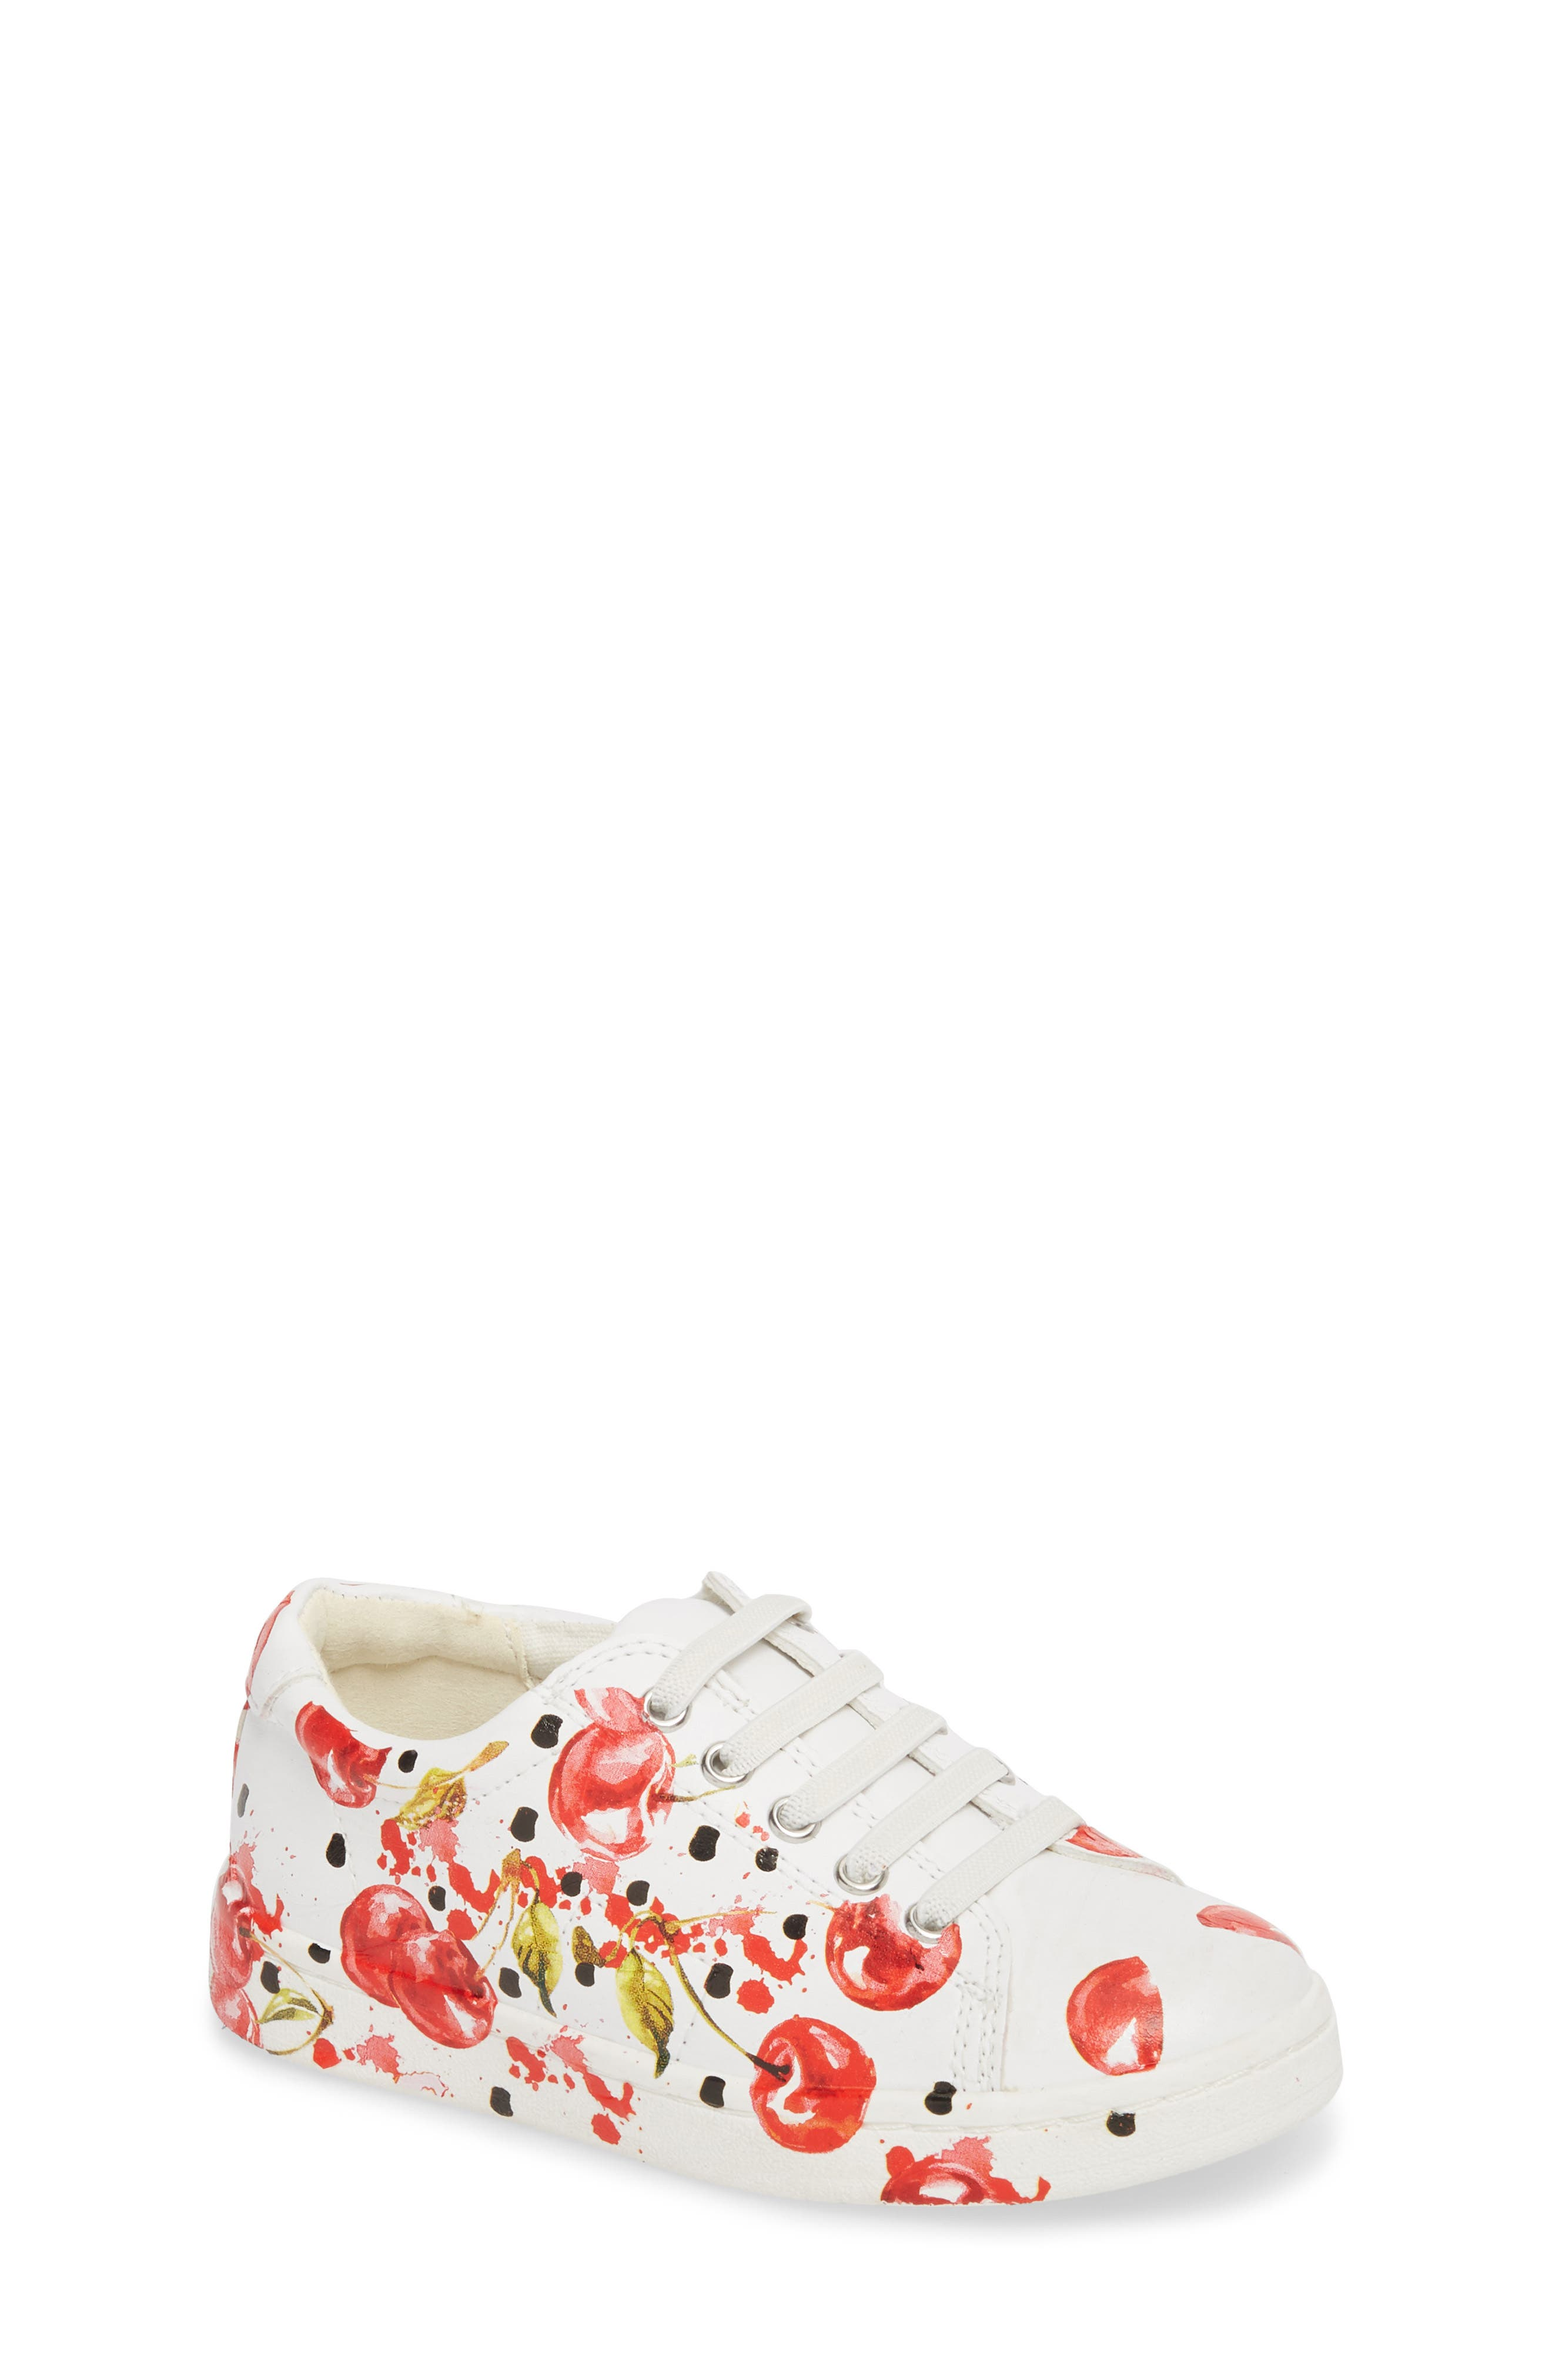 Blane Milford Fruit Print Sneaker,                             Main thumbnail 1, color,                             100